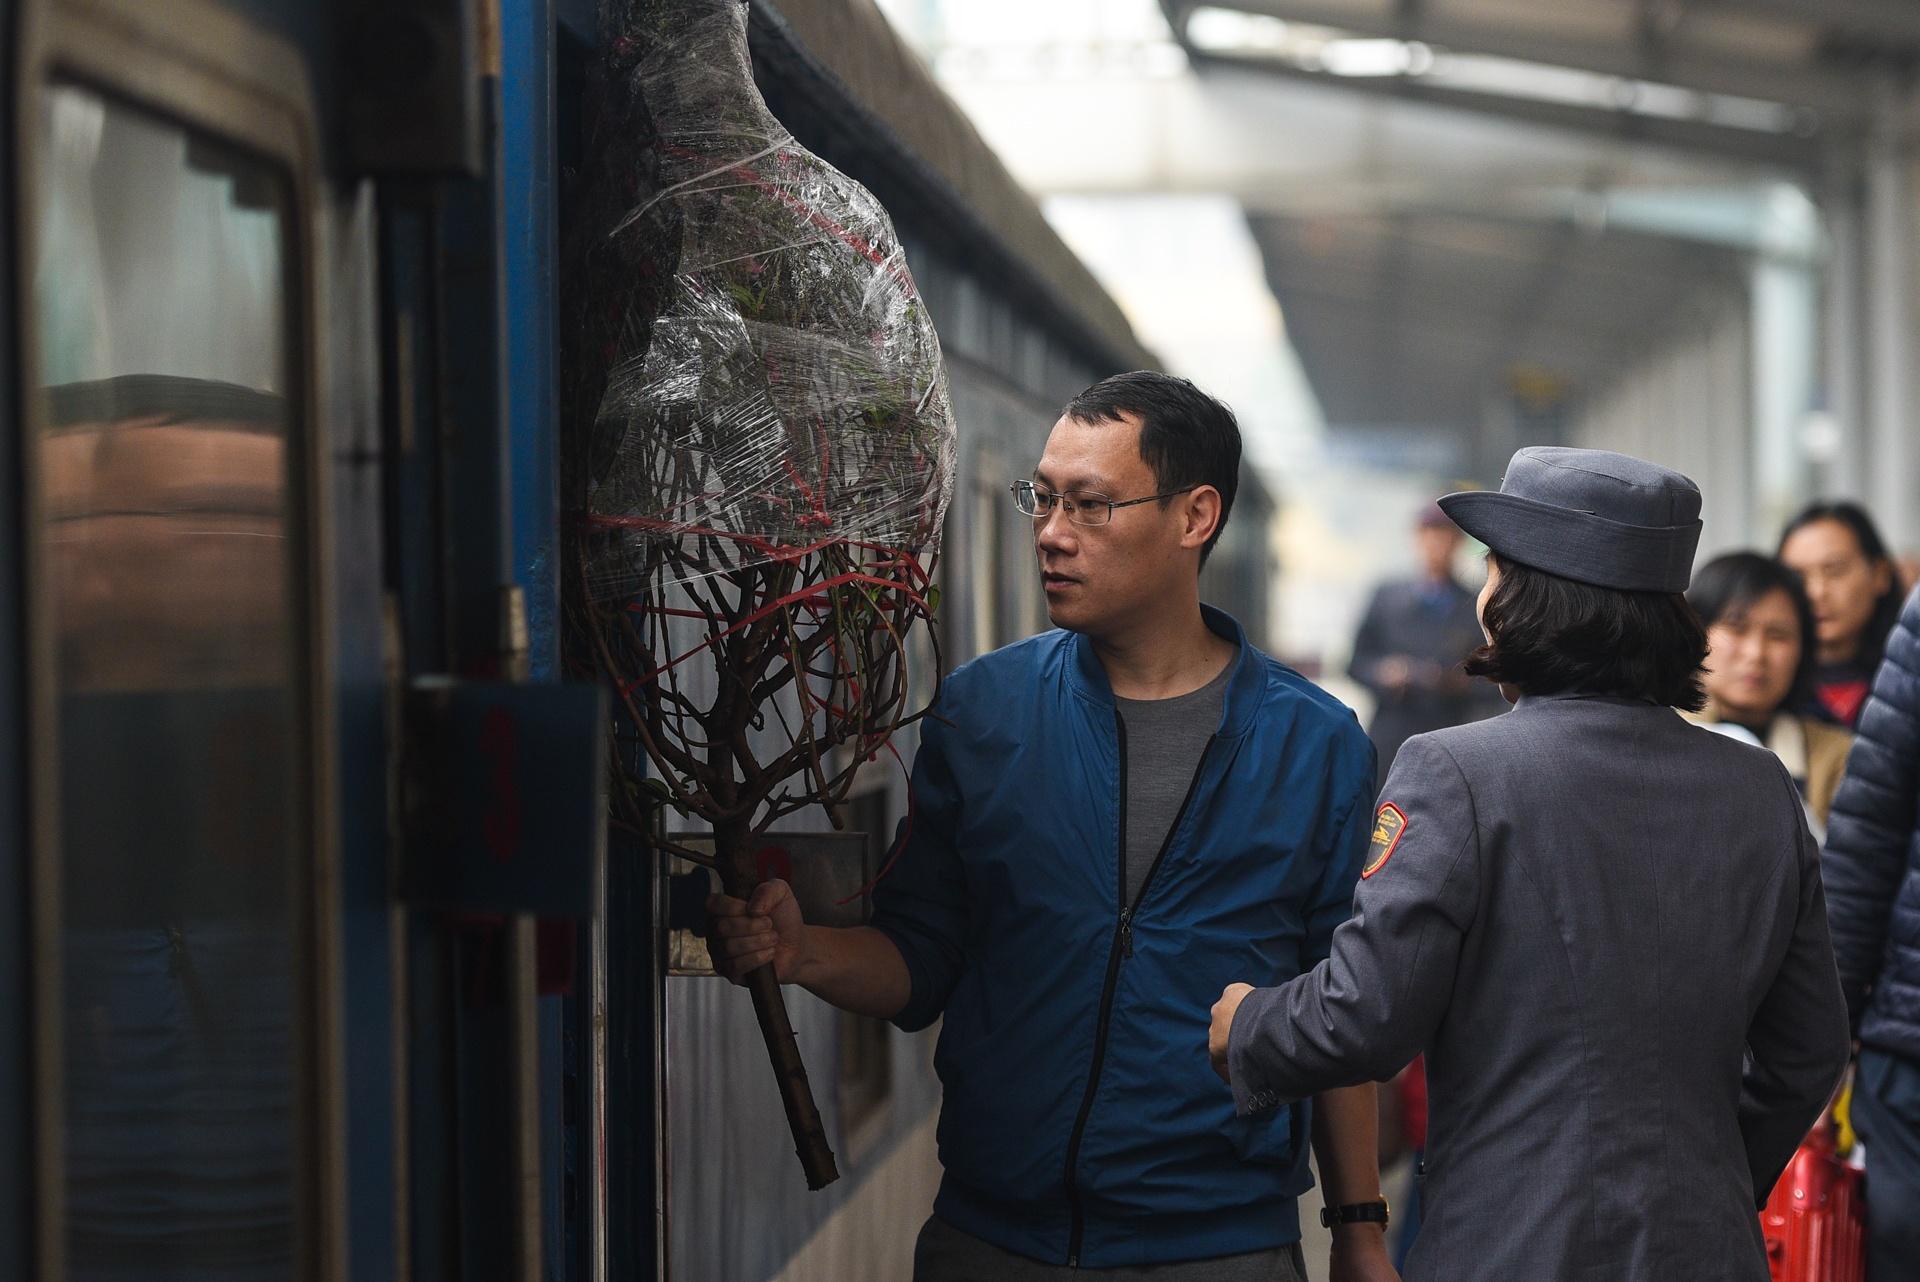 Tet tren nhung chuyen tau cuoi cung cua nam Ky Hoi hinh anh 1 DSC_1302_zing.jpg